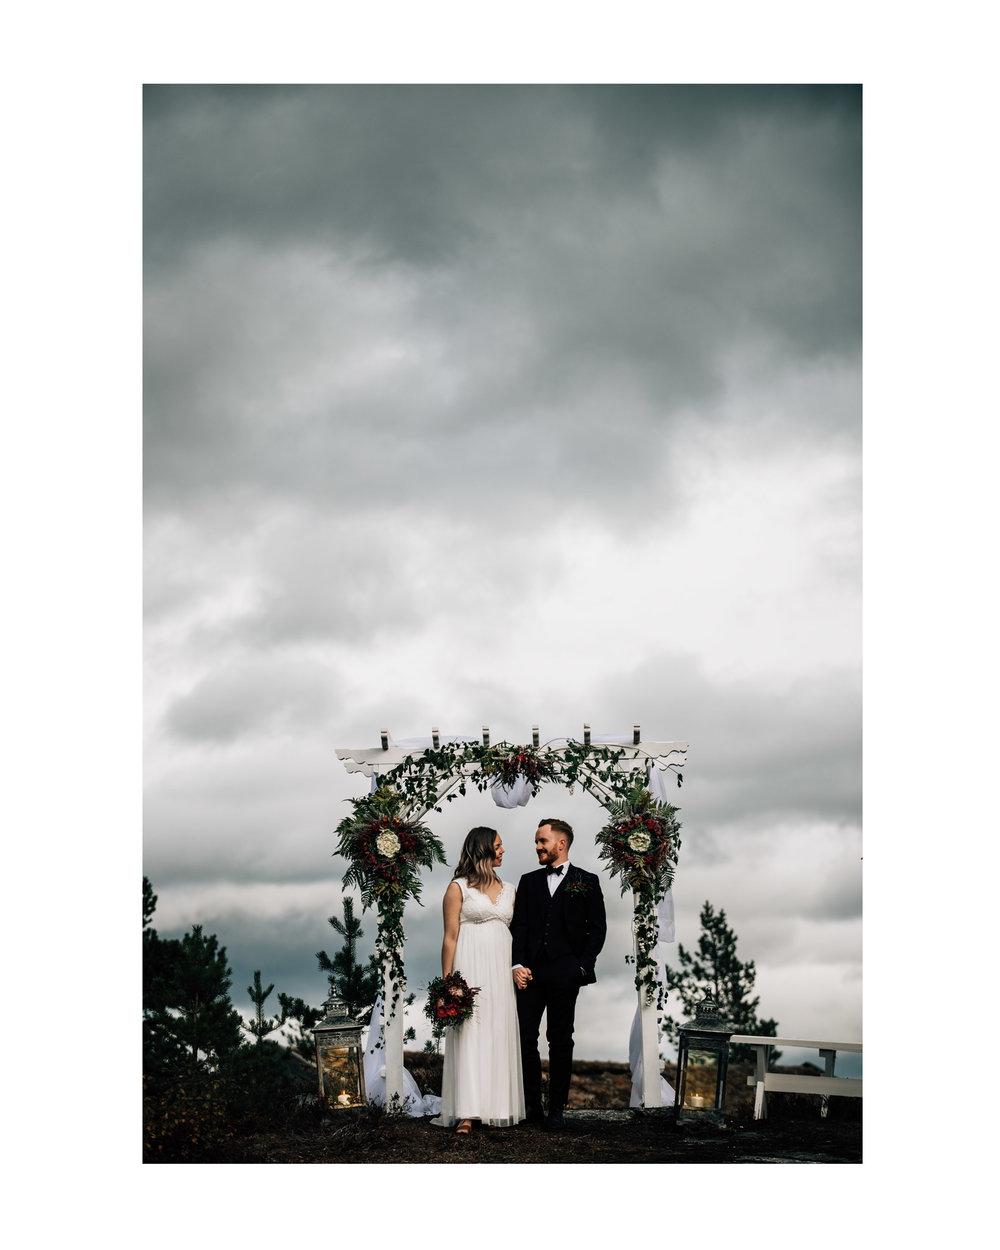 fotograf_-bryllup-vestfold--7.jpg